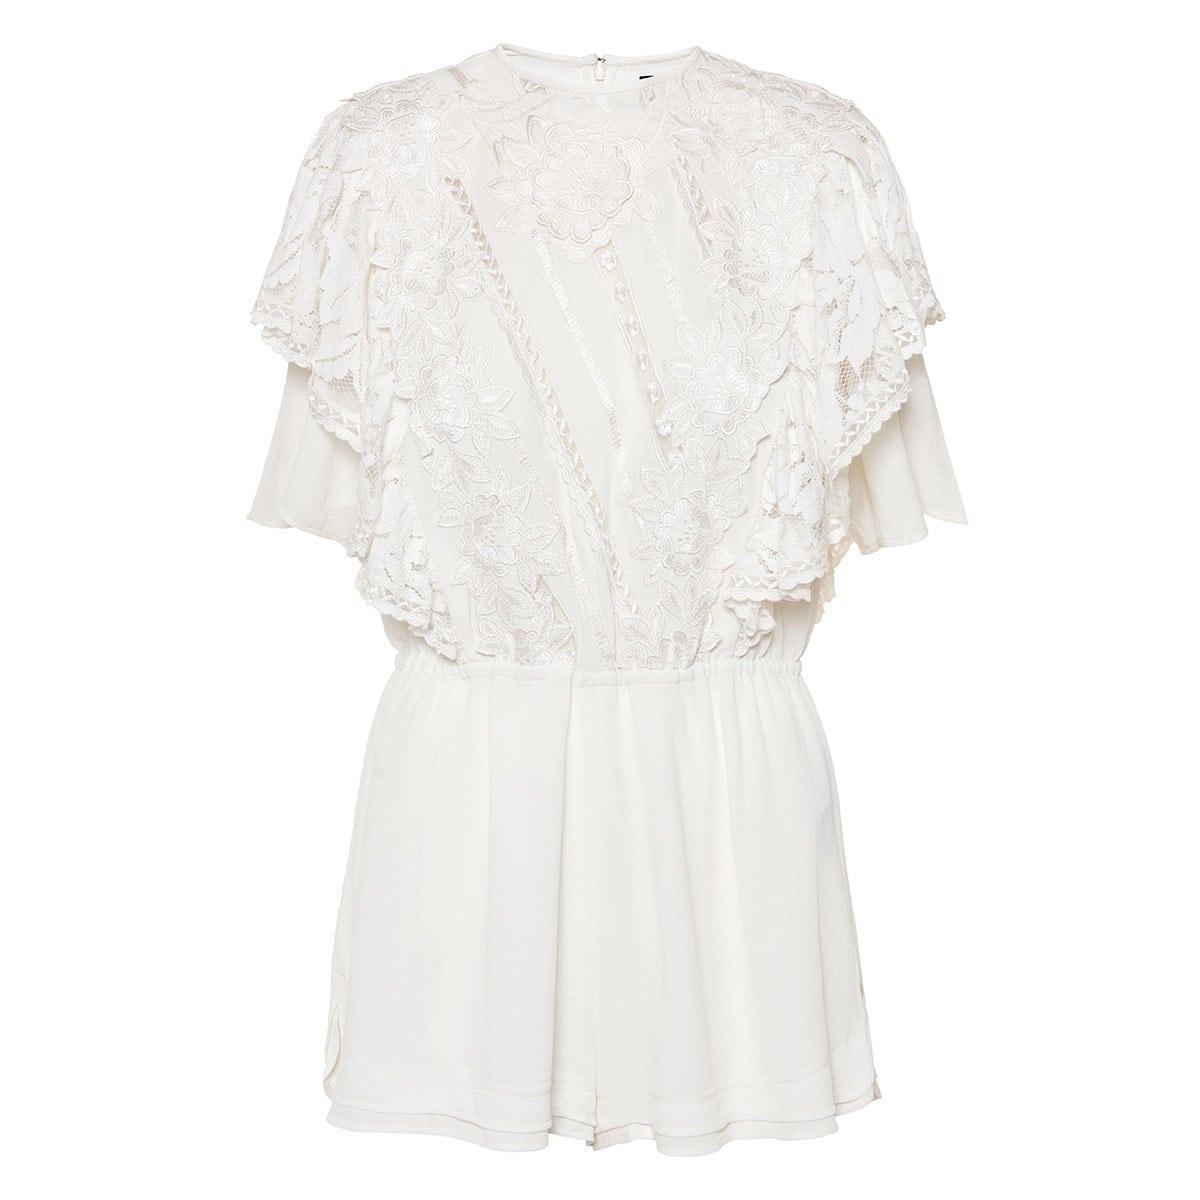 Lace-paneled silk playsuit